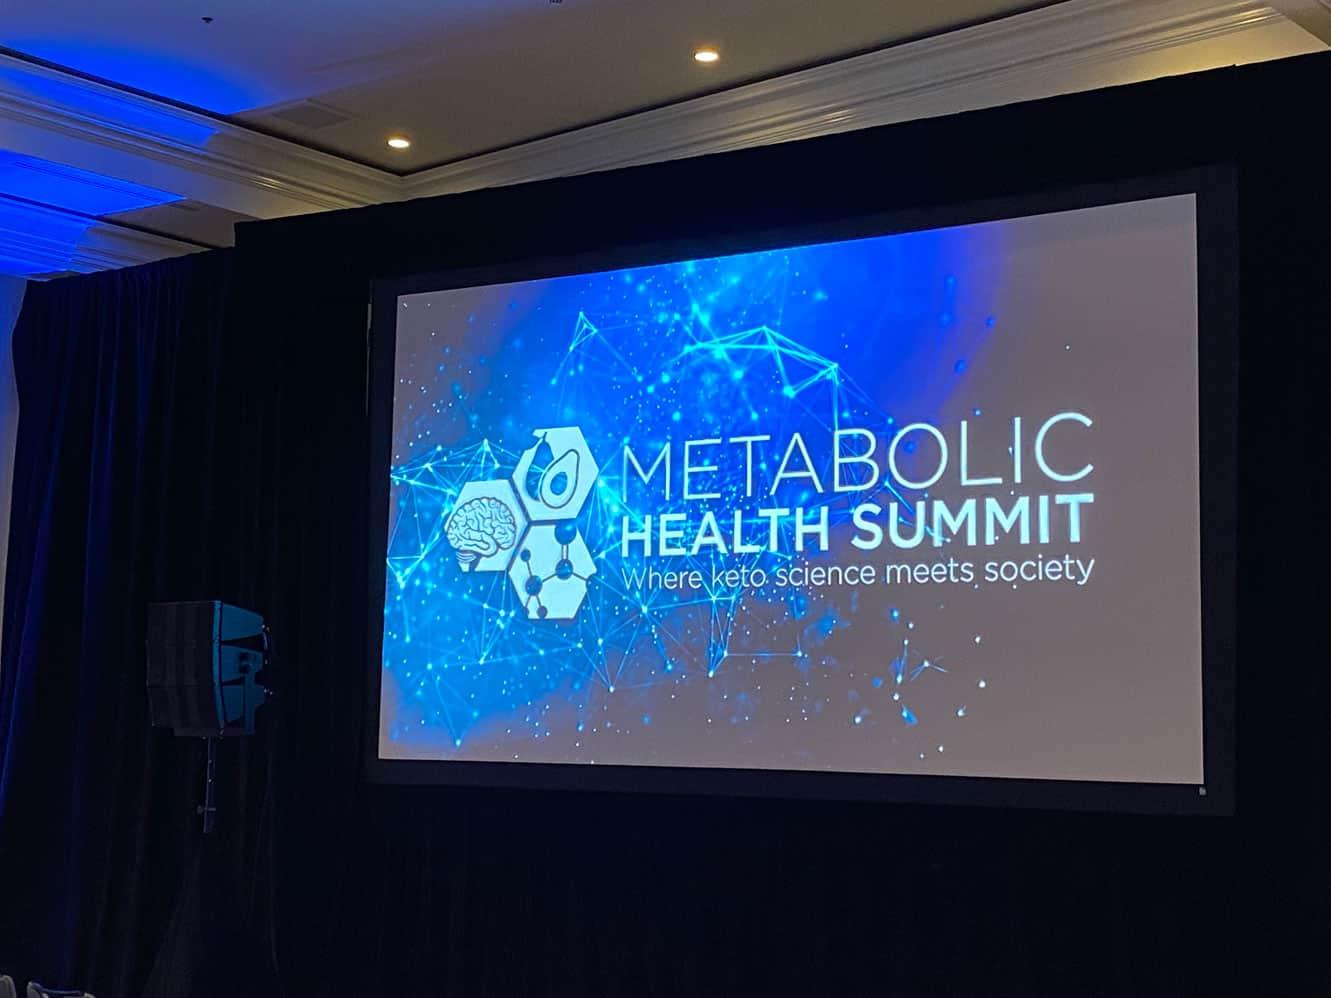 Keto konference i USA - Metabolic Health Summit